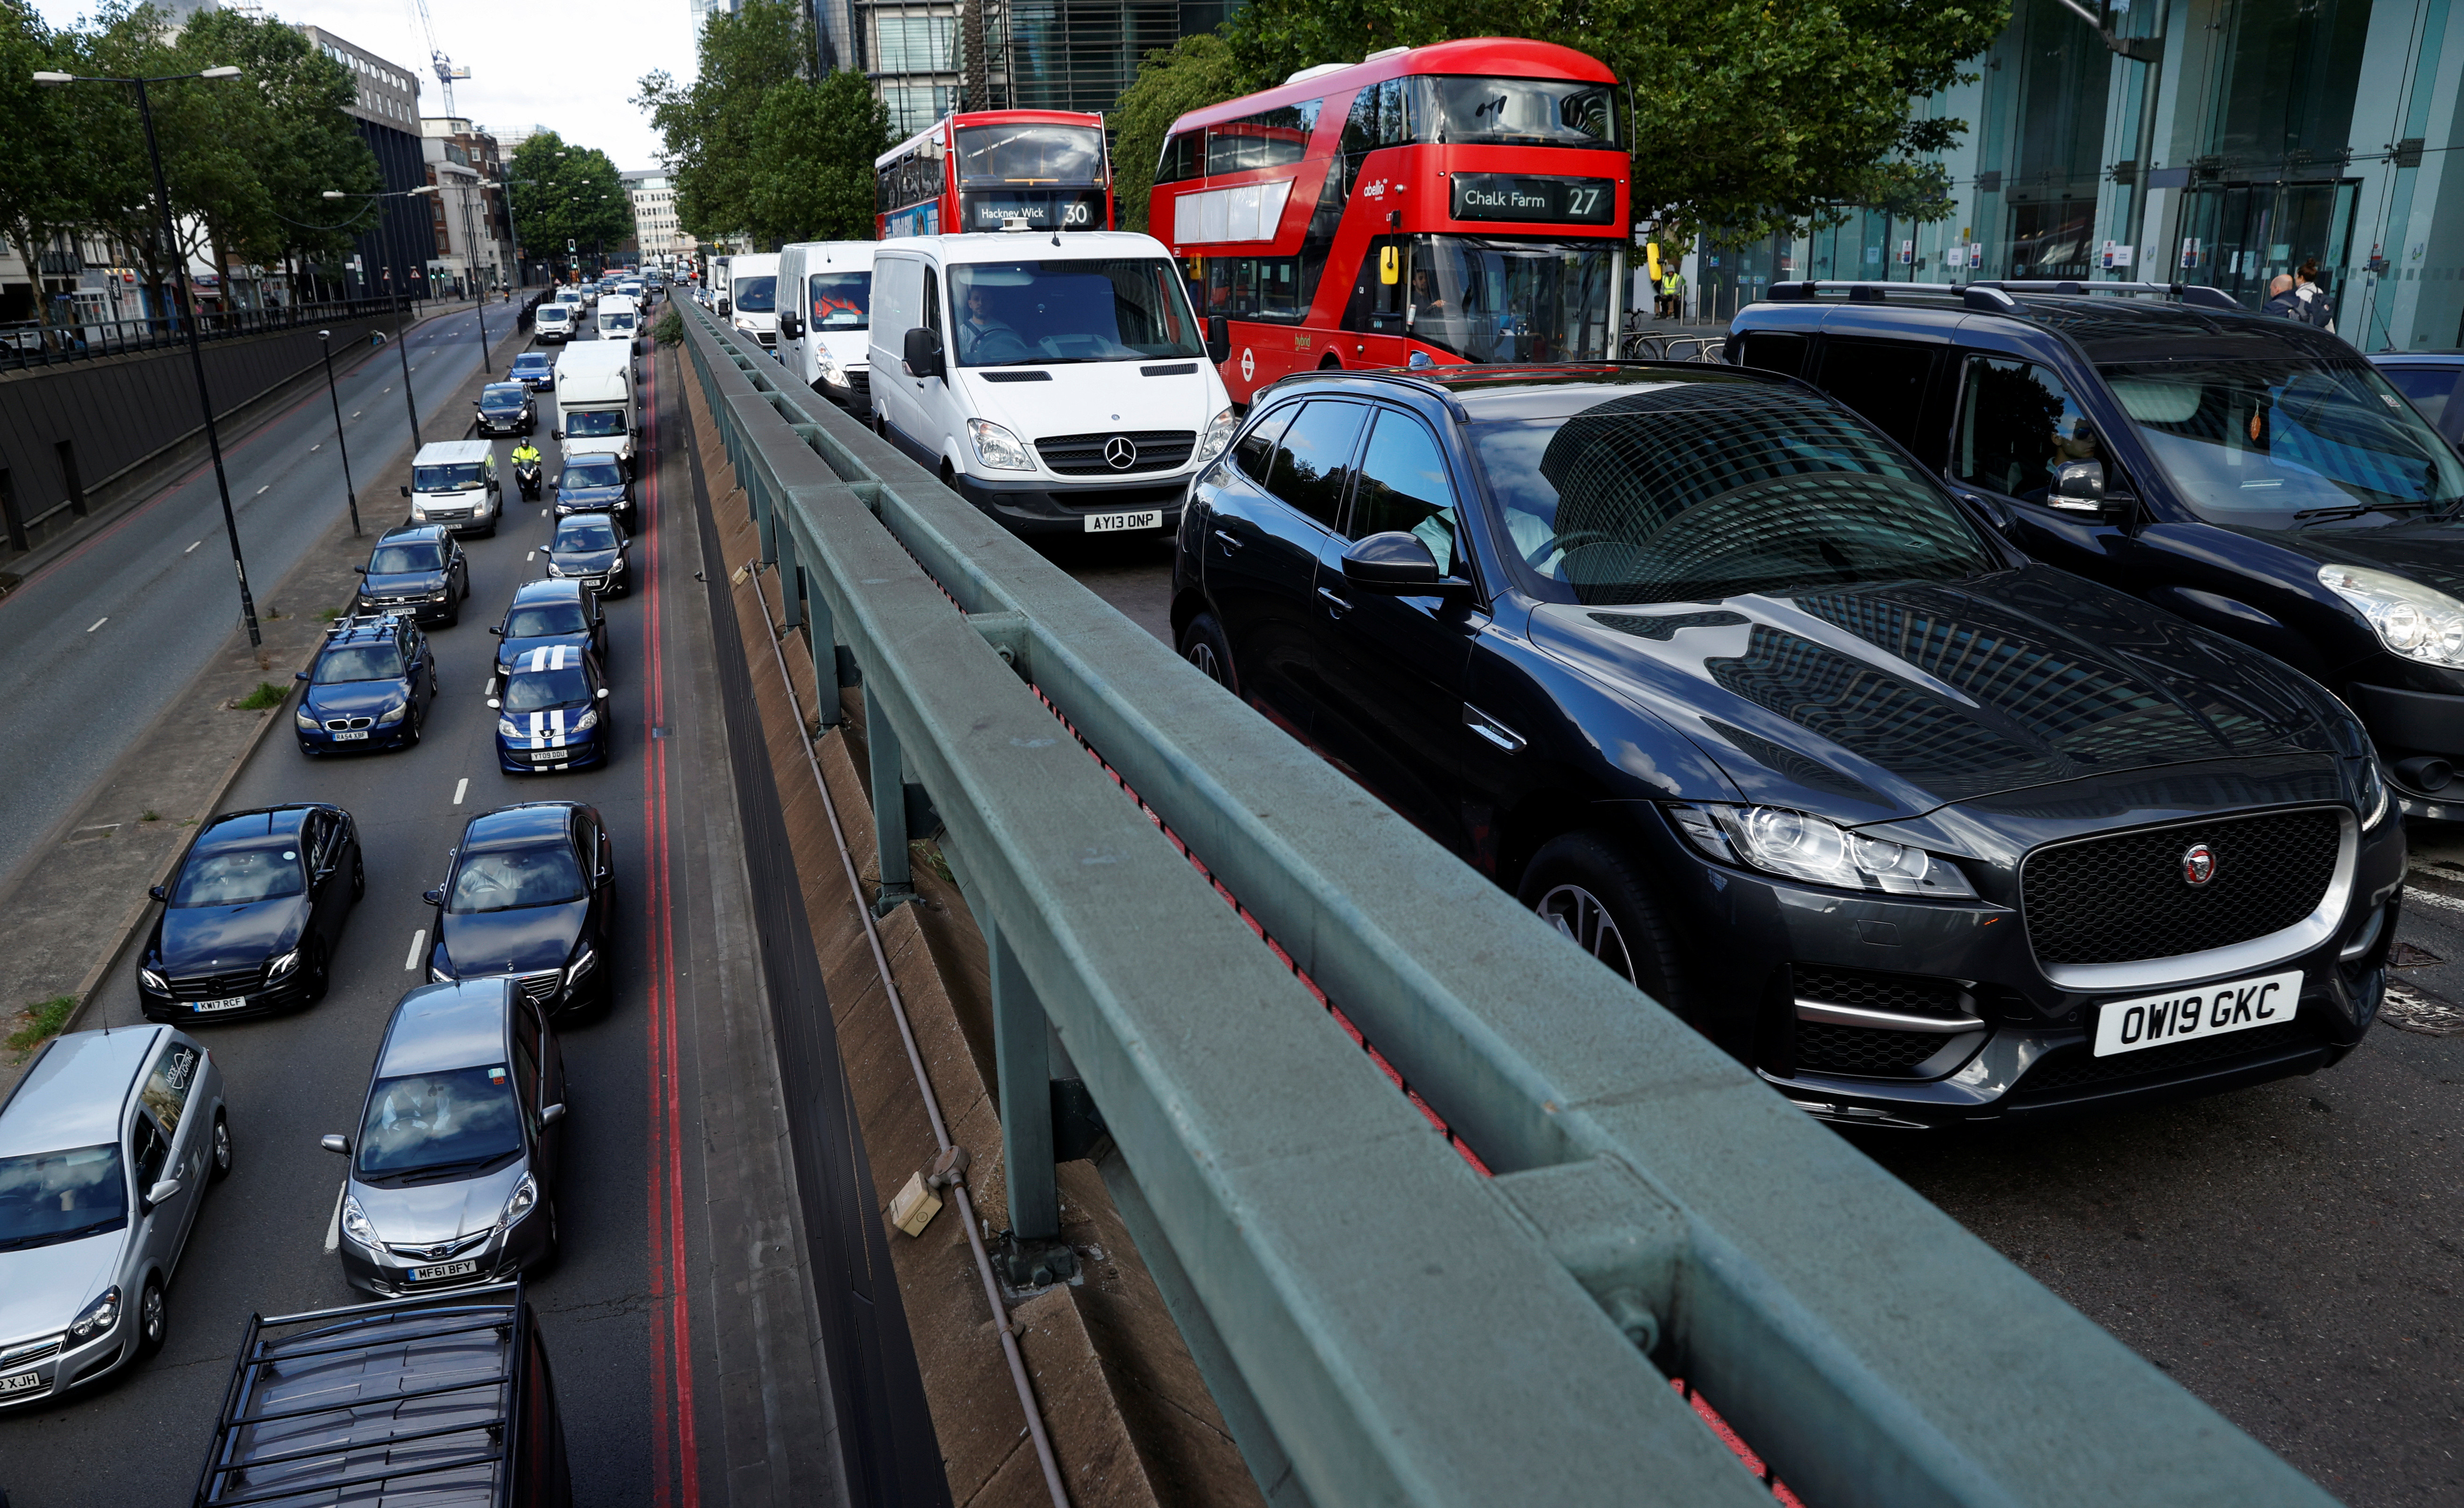 Britain petrol electric car green revolution Boris Johnson 2030